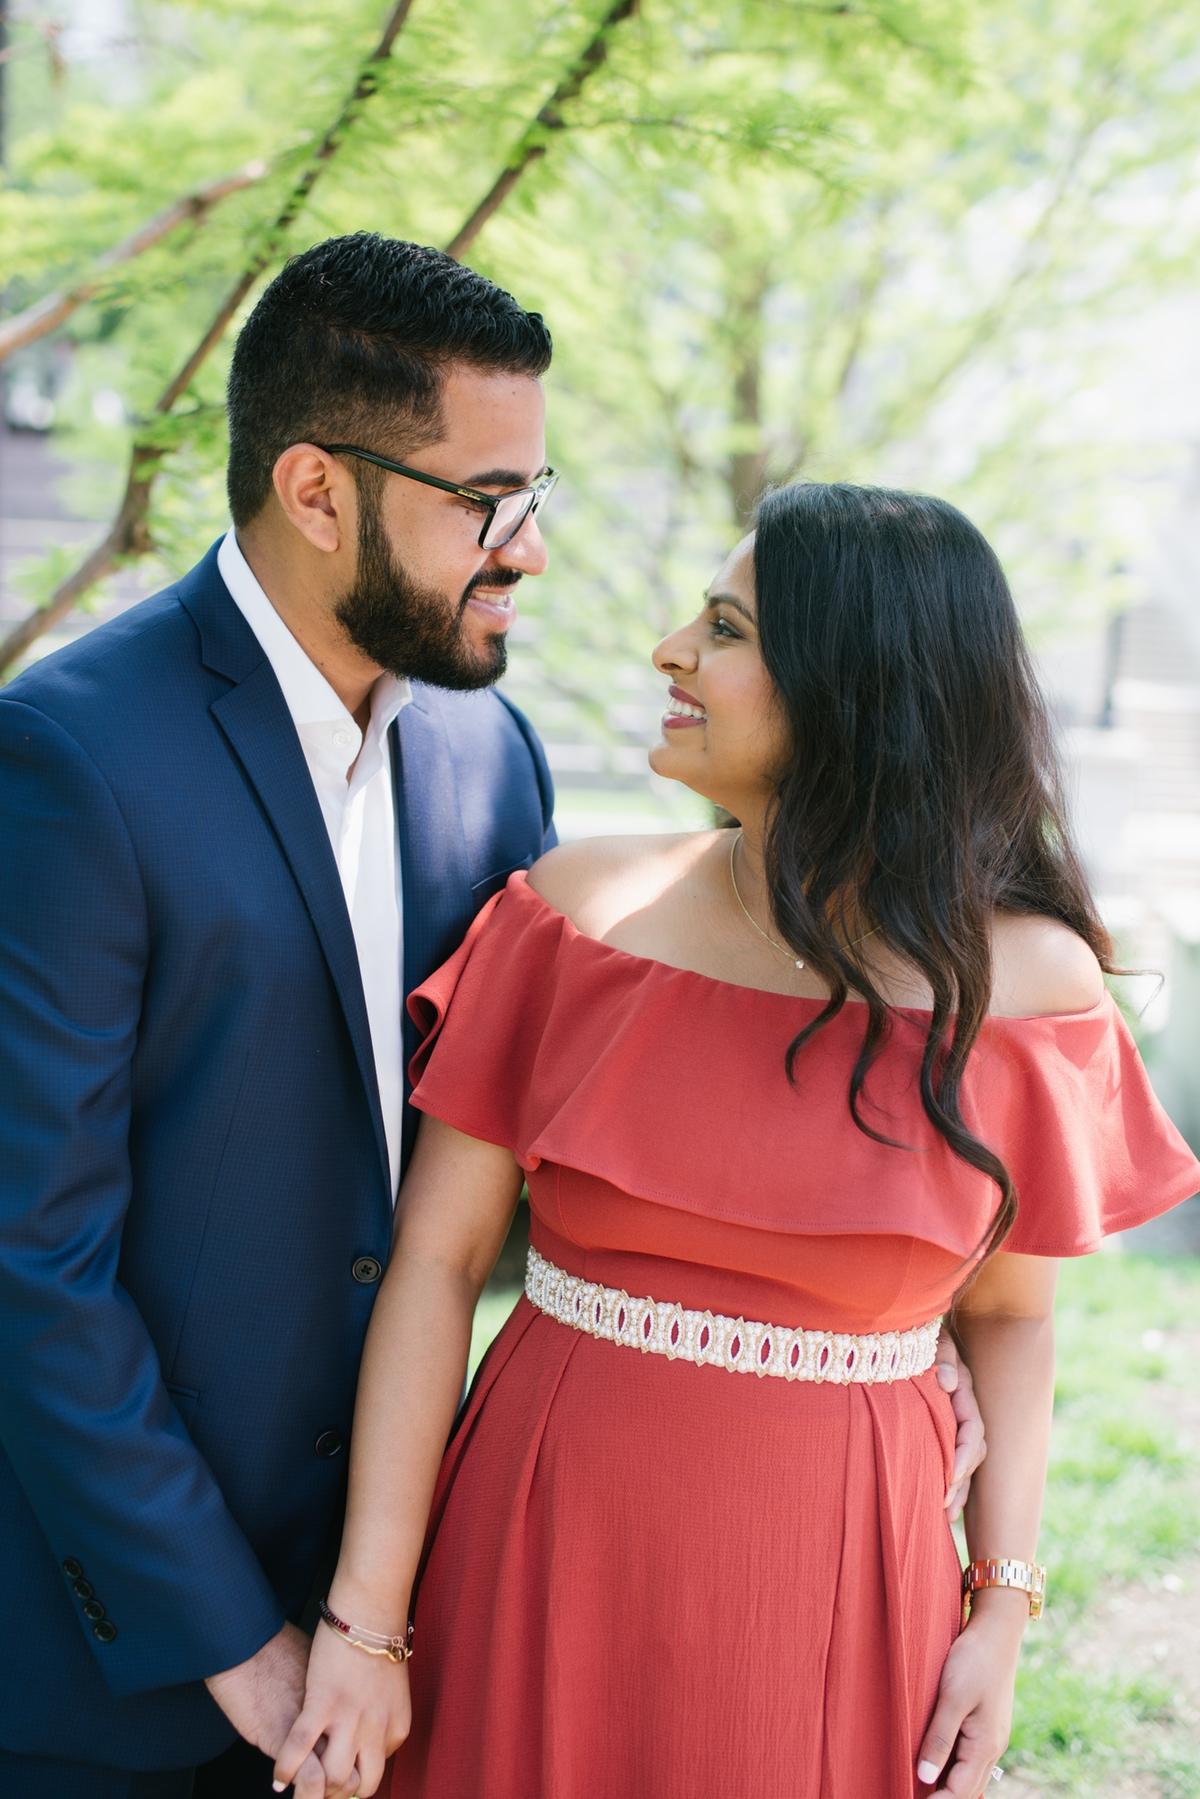 Le Cape Weddings - Sindhura - Chicago Engagement Session_-7.jpg